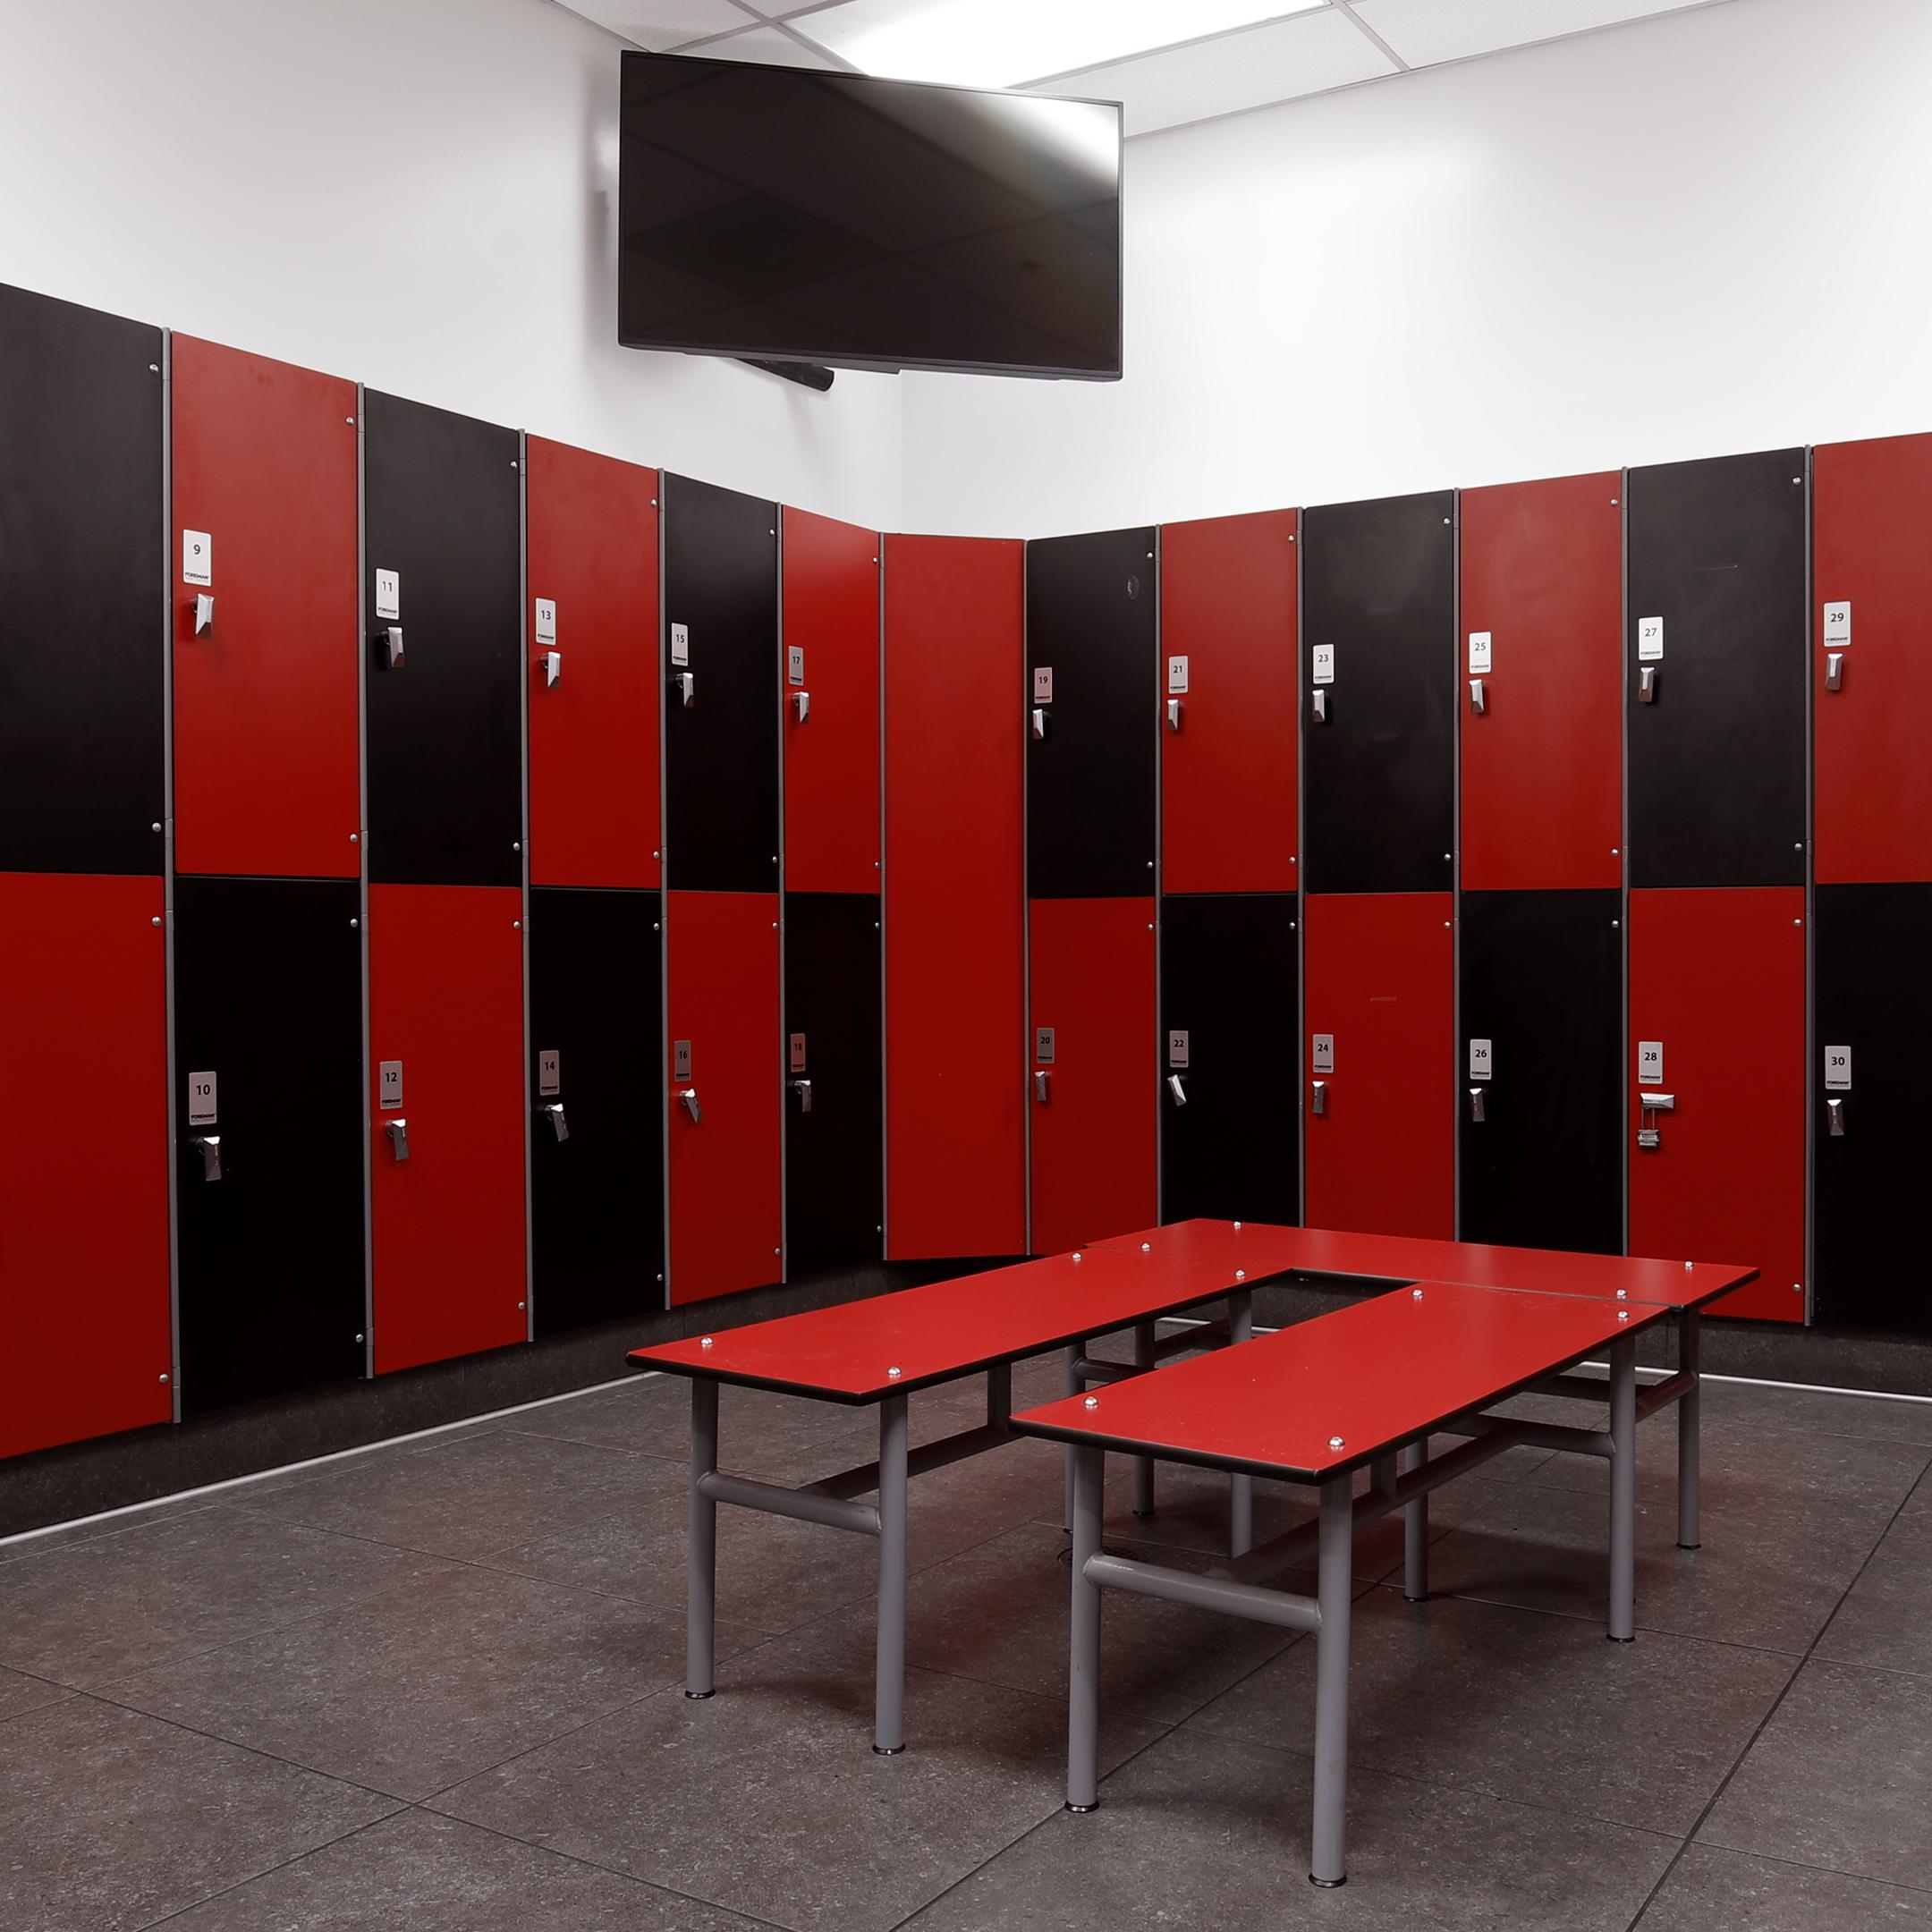 Locker Rooms Featured Image